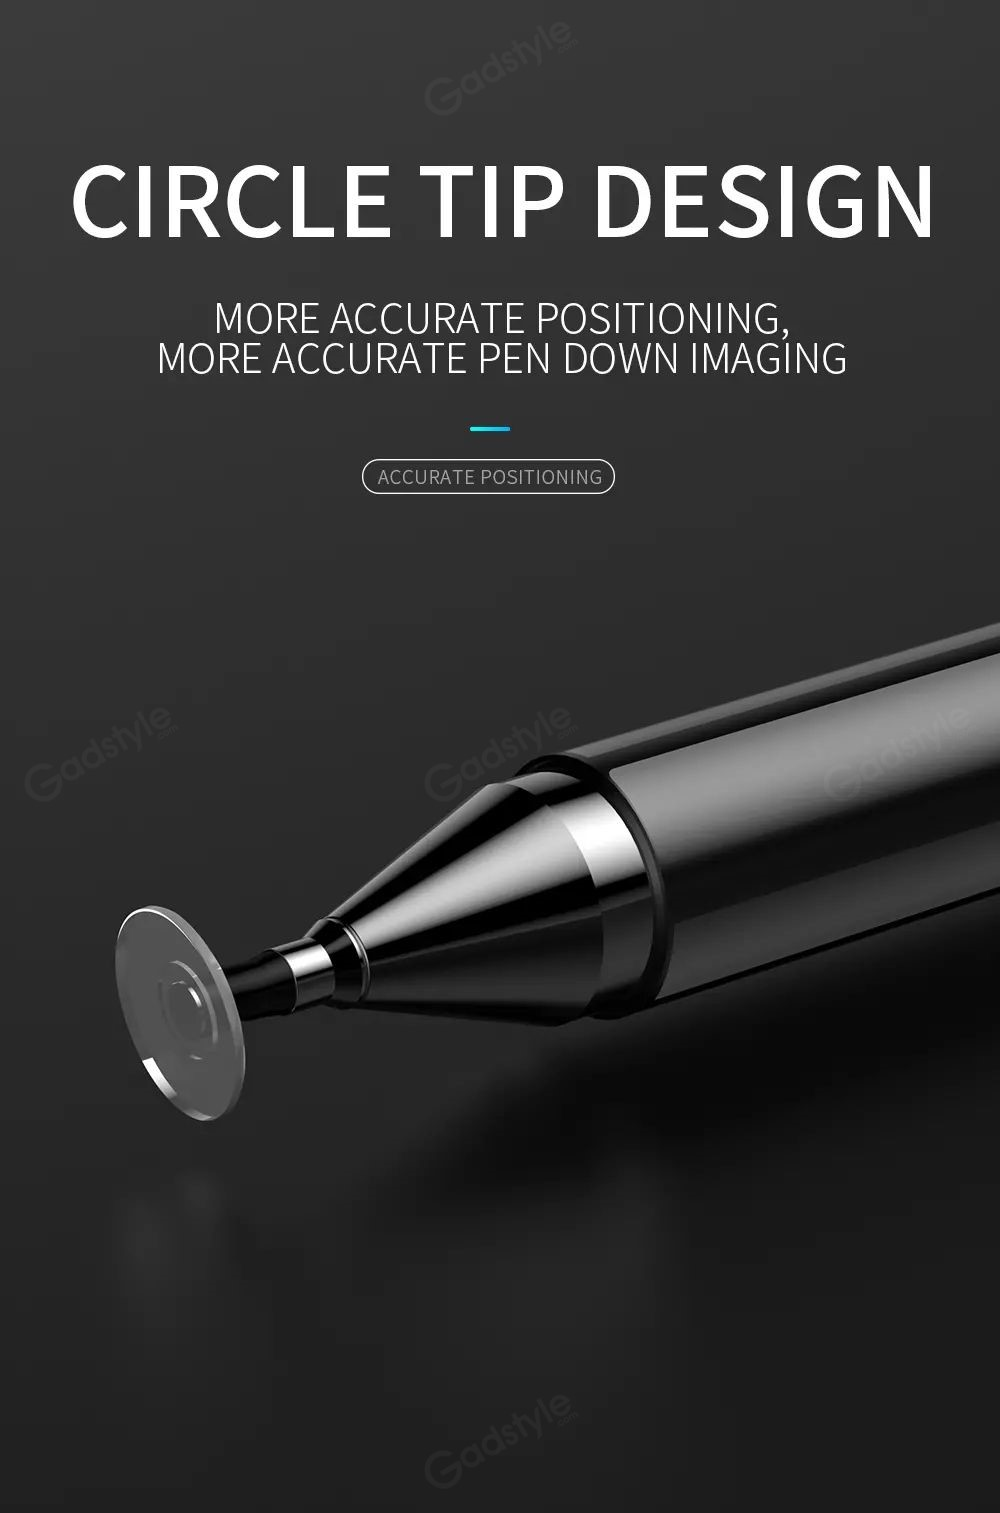 Joyroom Passive Capacitive Touch Screen Stylus Pen (5)